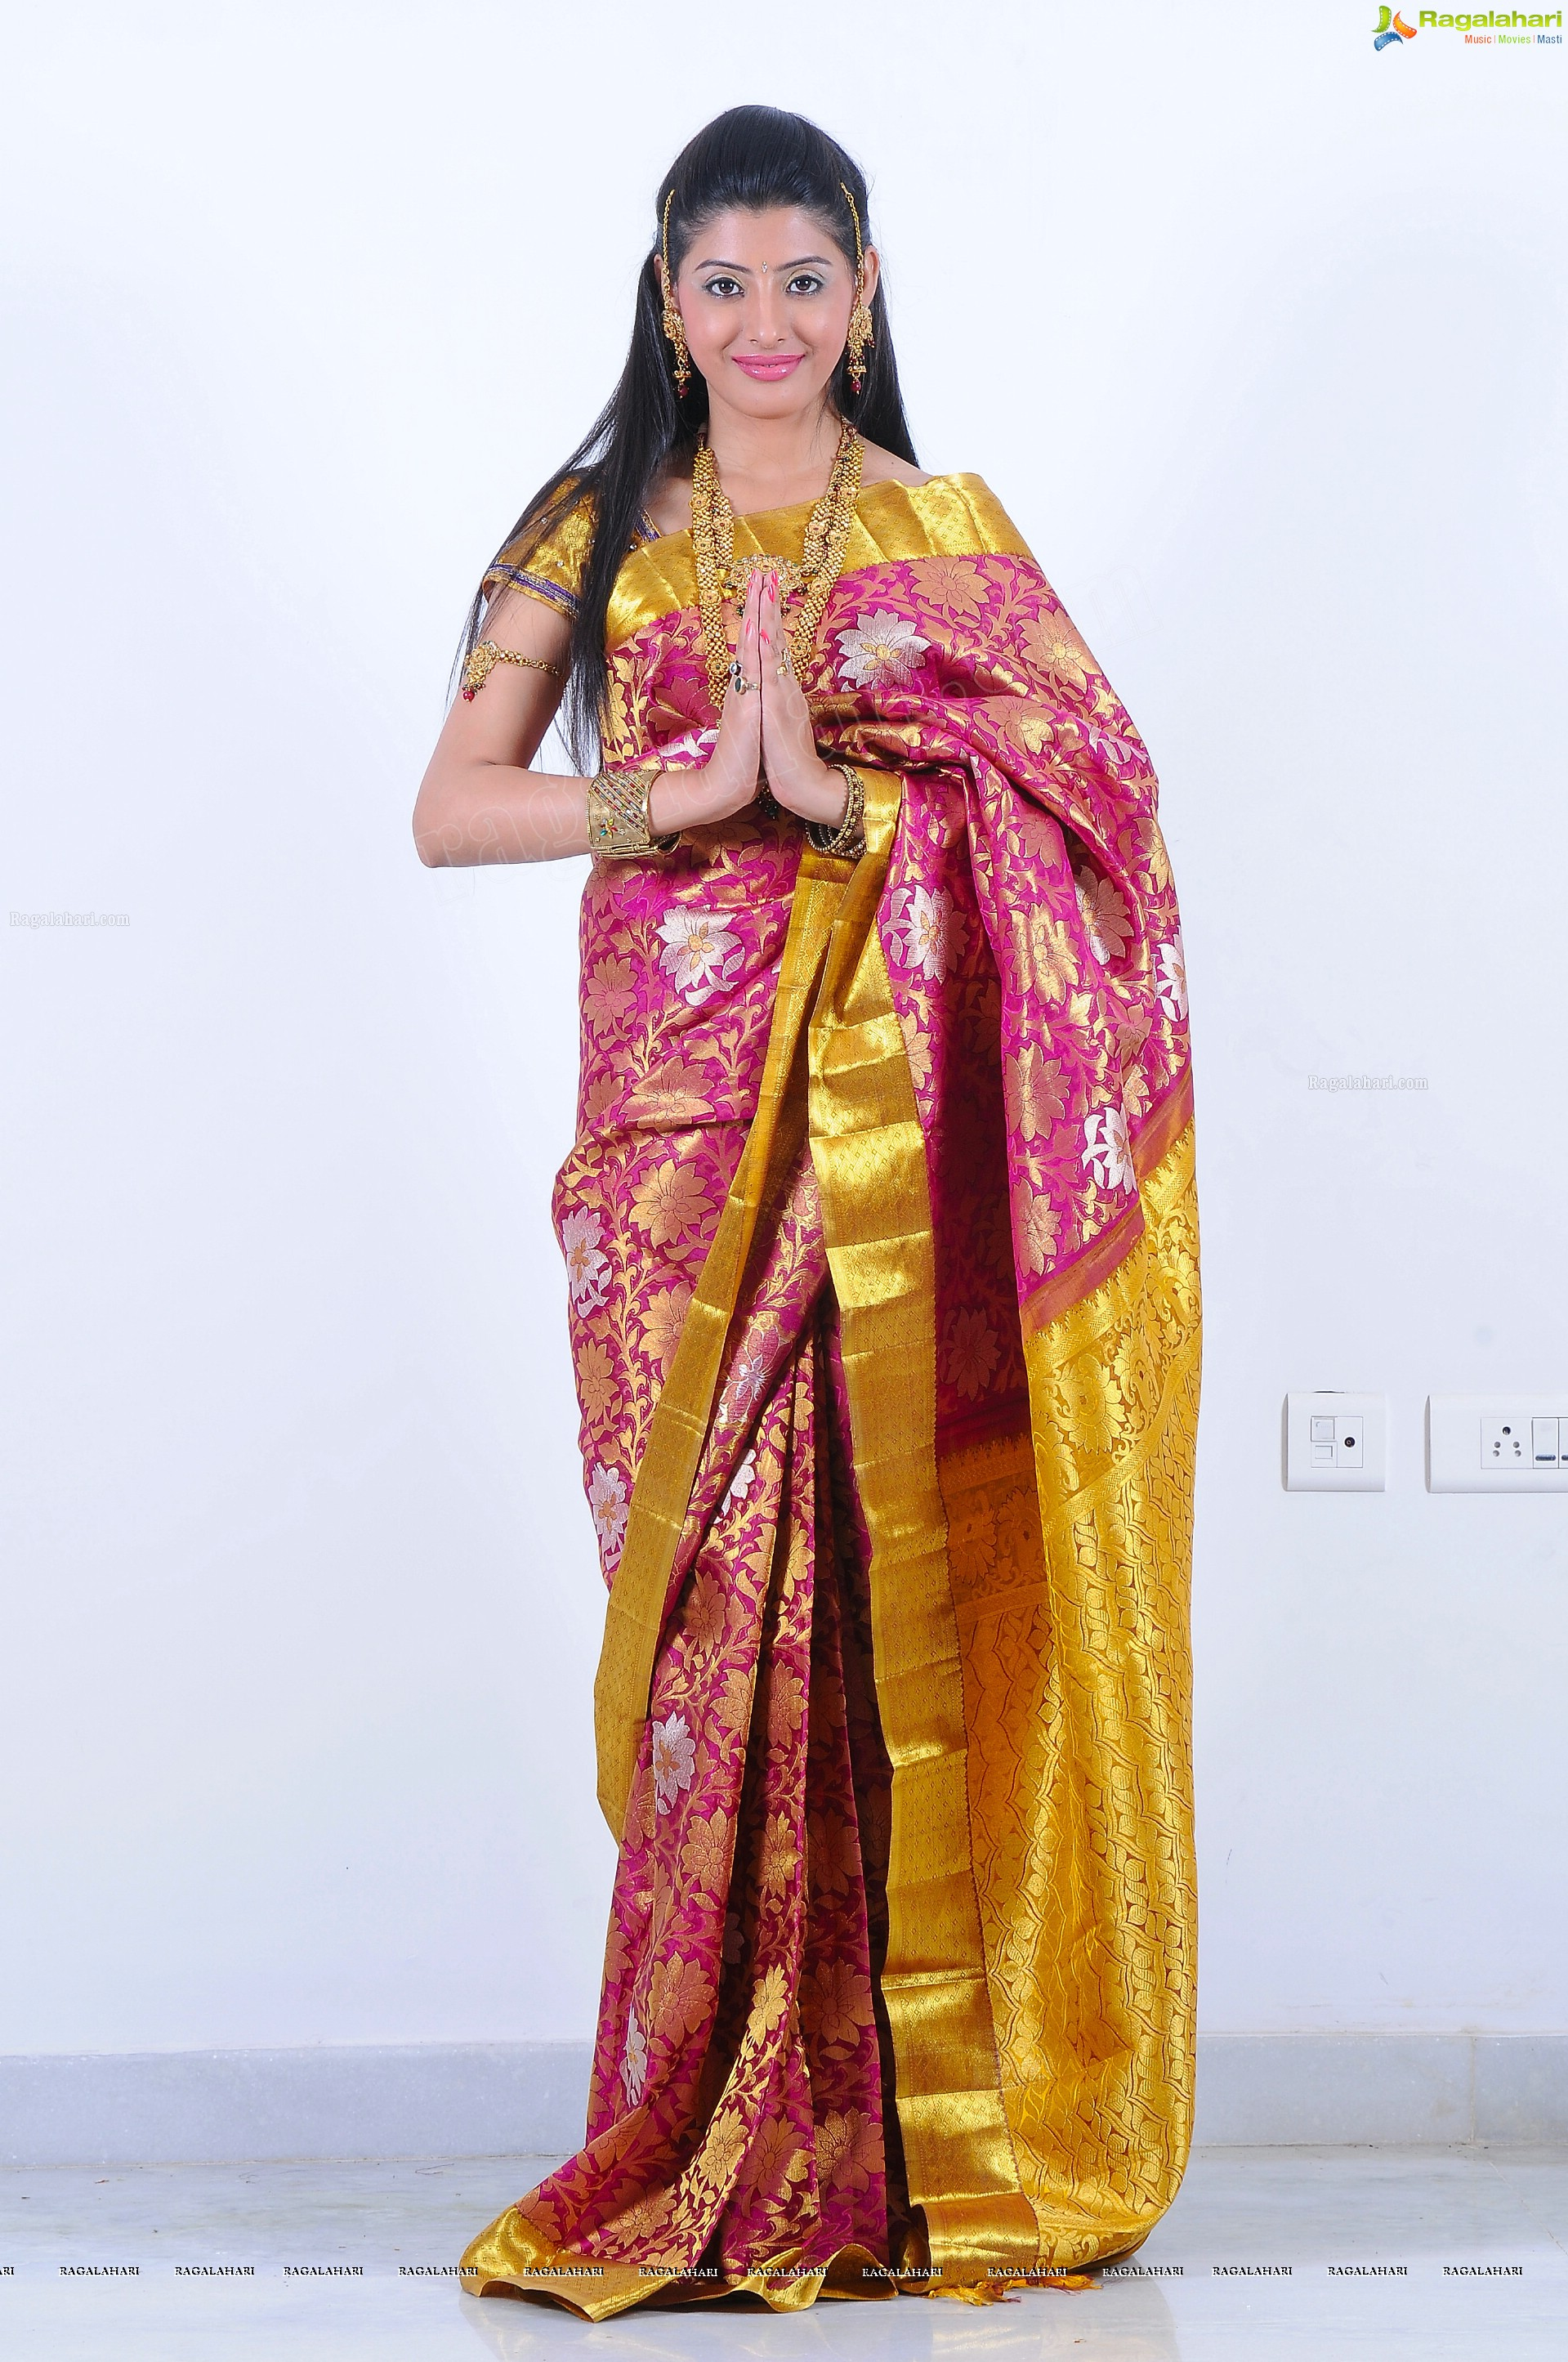 kushi (hd) image 54 | tollywood actress gallery,stills, heroines